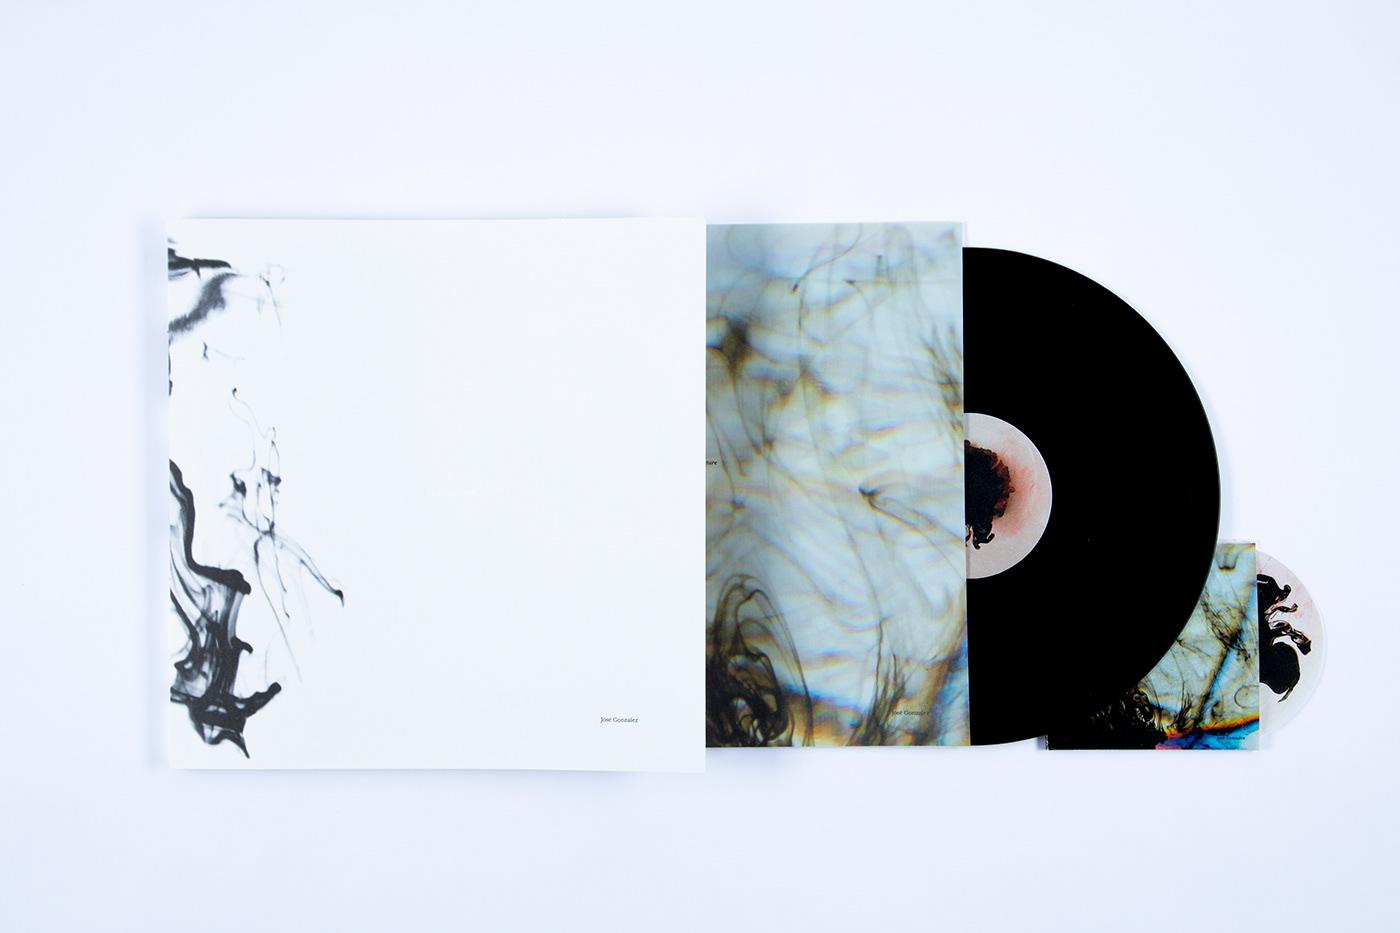 lyric book Album editorial music design Packaging Photography  graphic design  embossing Book Binding